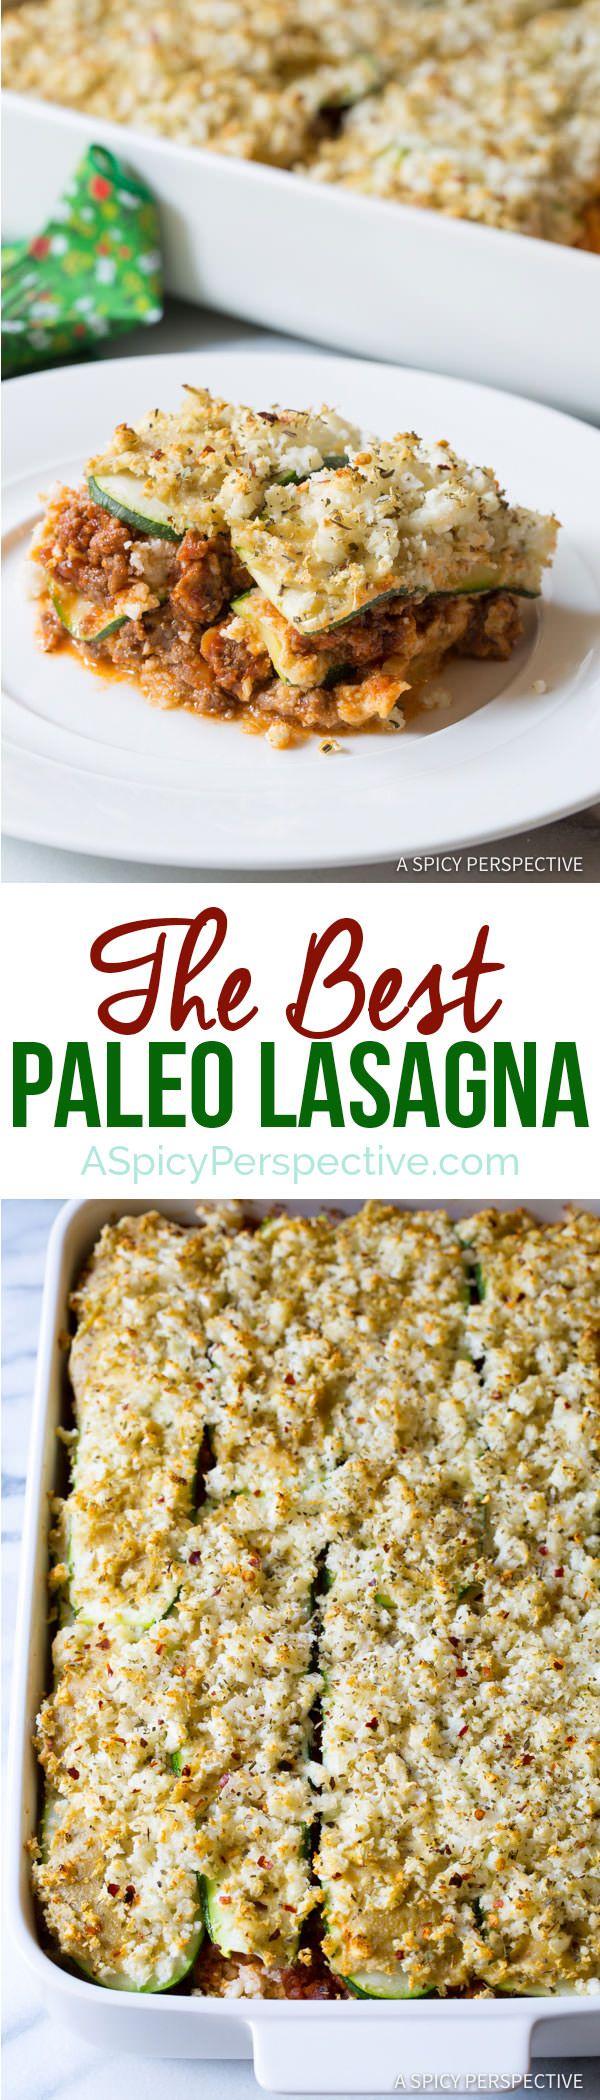 The Best Paleo Lasagna Recipe | ASpicyPerspective.com